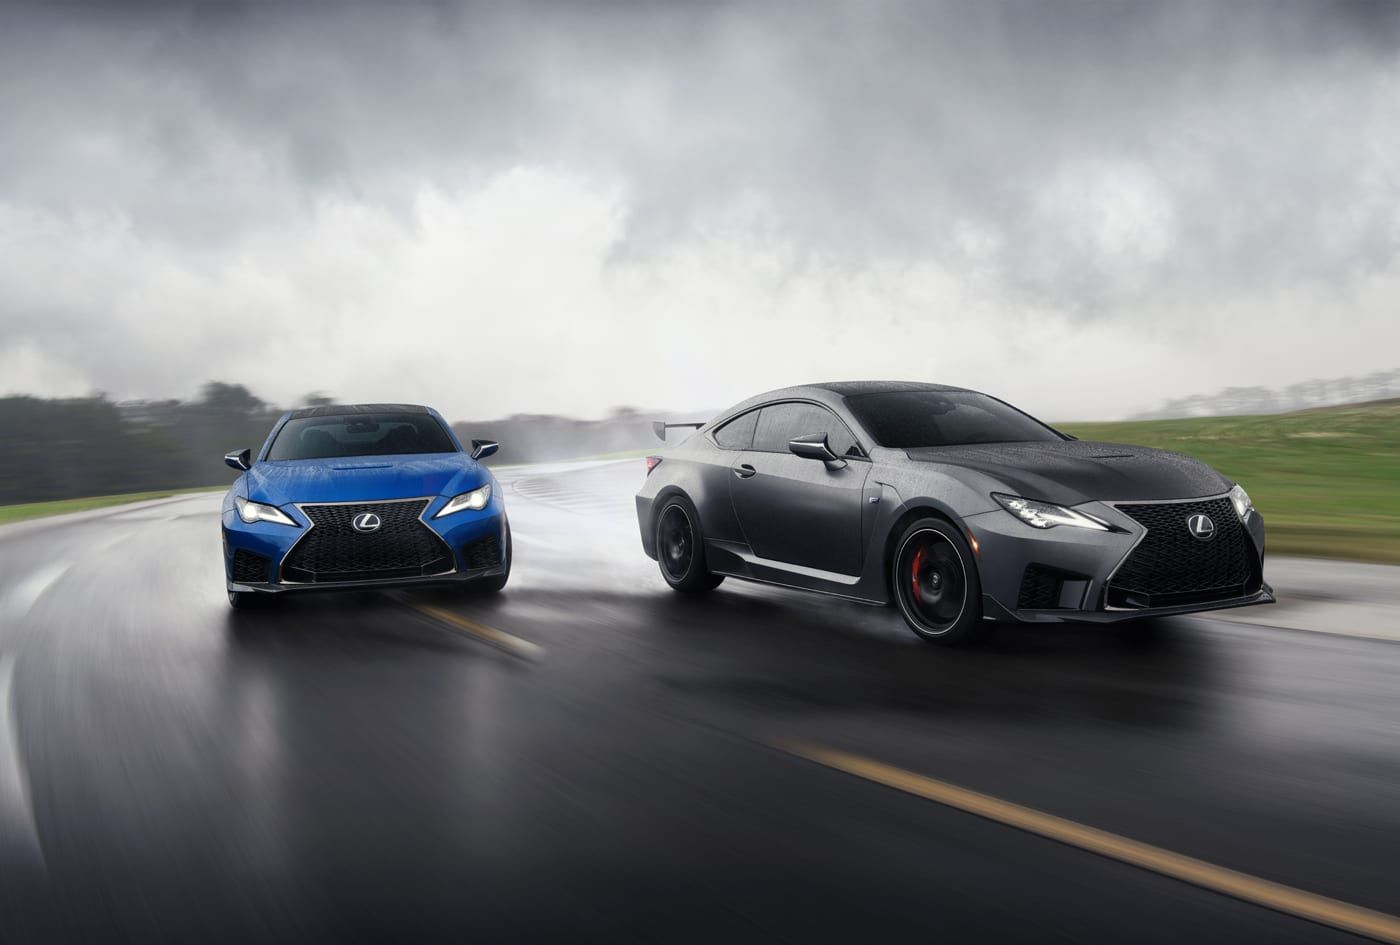 The 2020 Lexus Rc F Track Edition Refined Performance Lexus Lexus Lc Lexus Coupe